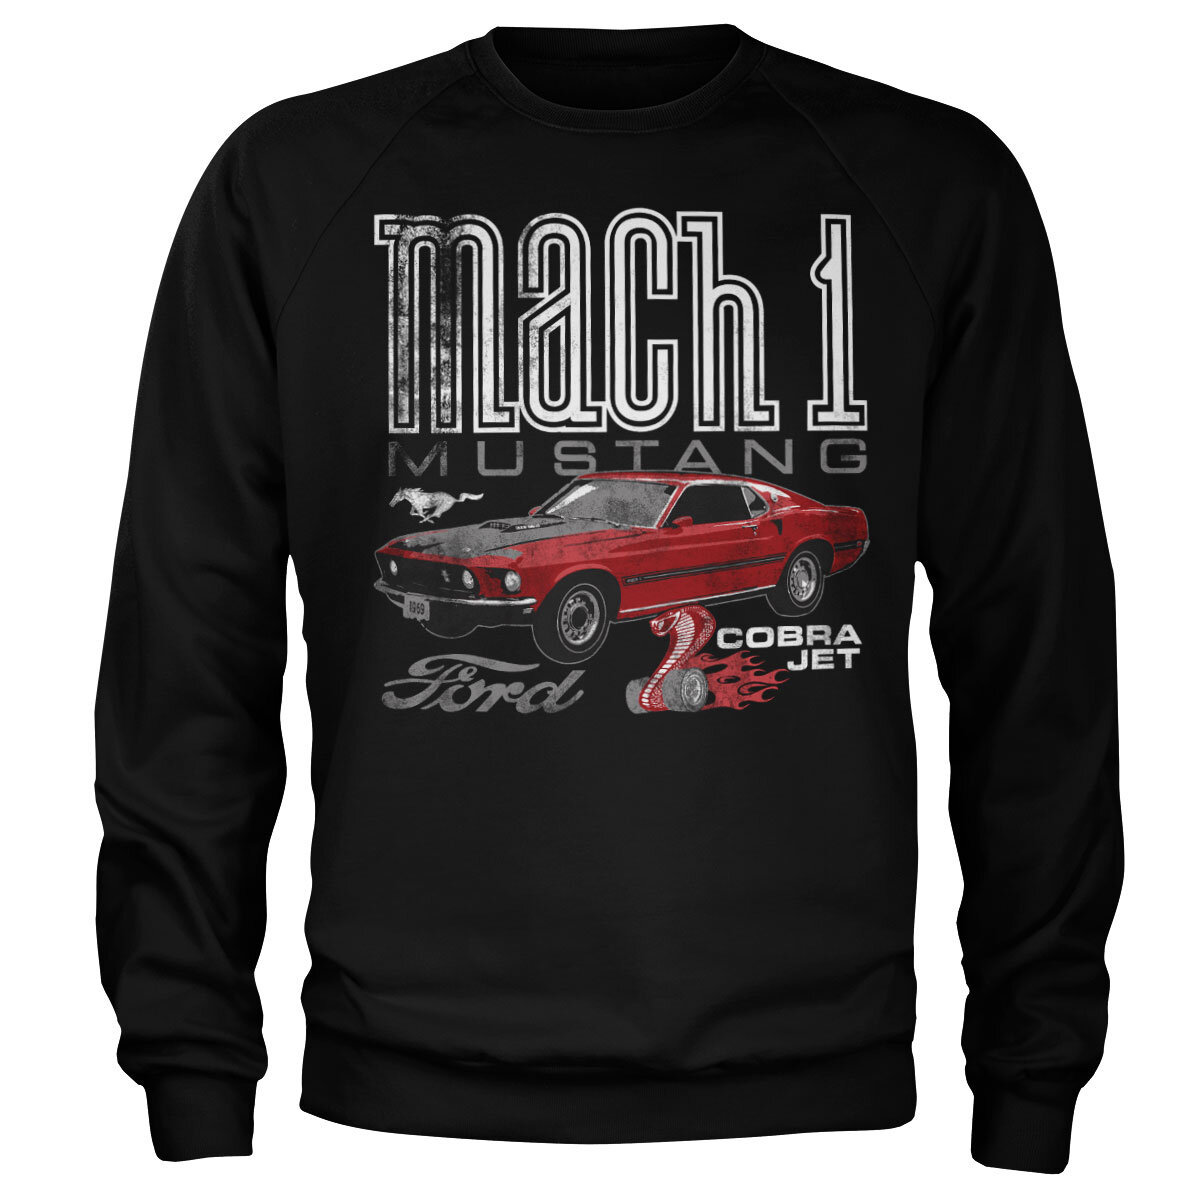 Ford Mach-1 Mustang Sweatshirt